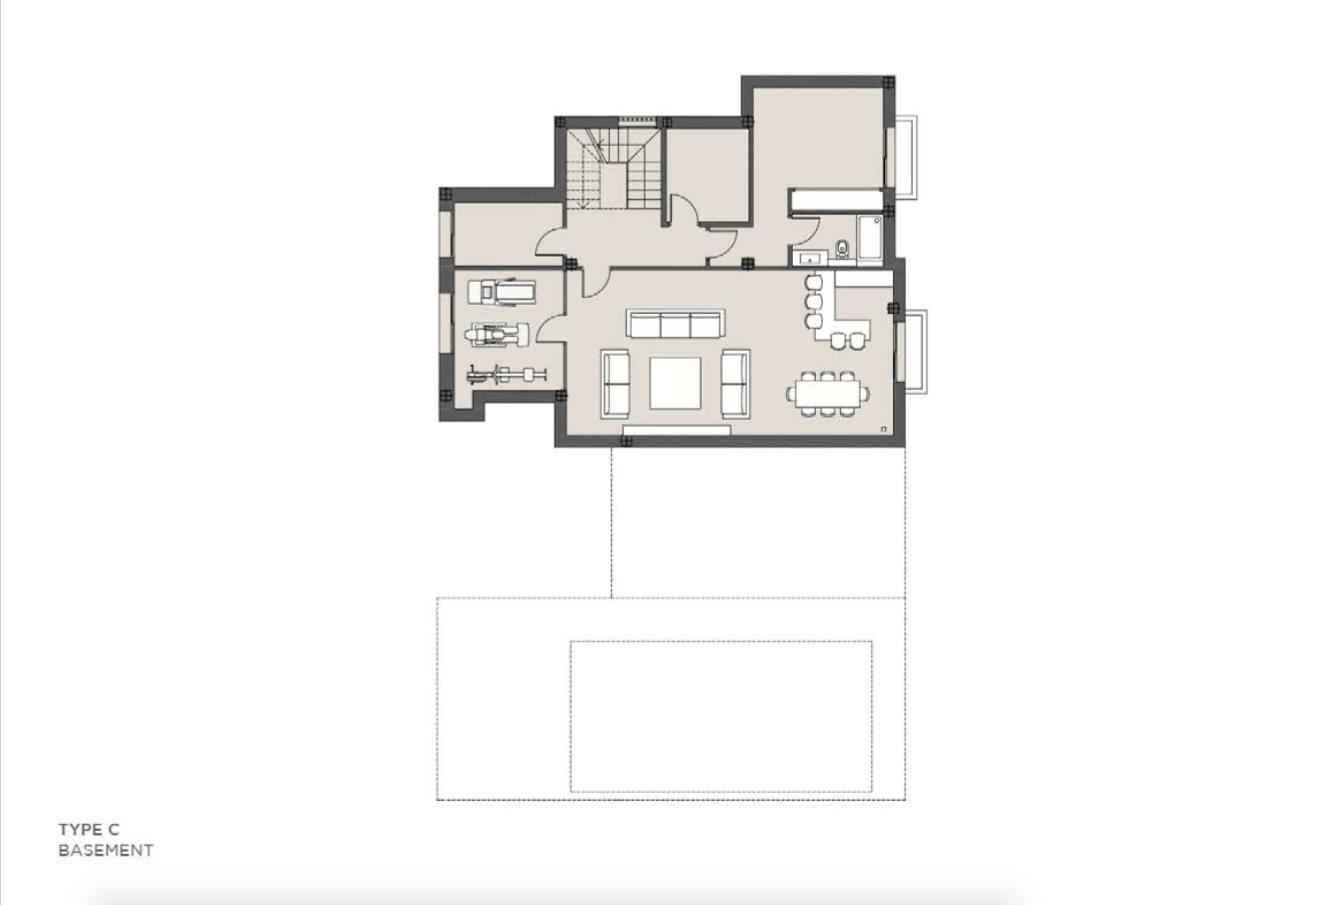 los olivos del paraiso benahavis moderne nieuwbouw villa te koop grondplan type c kelder